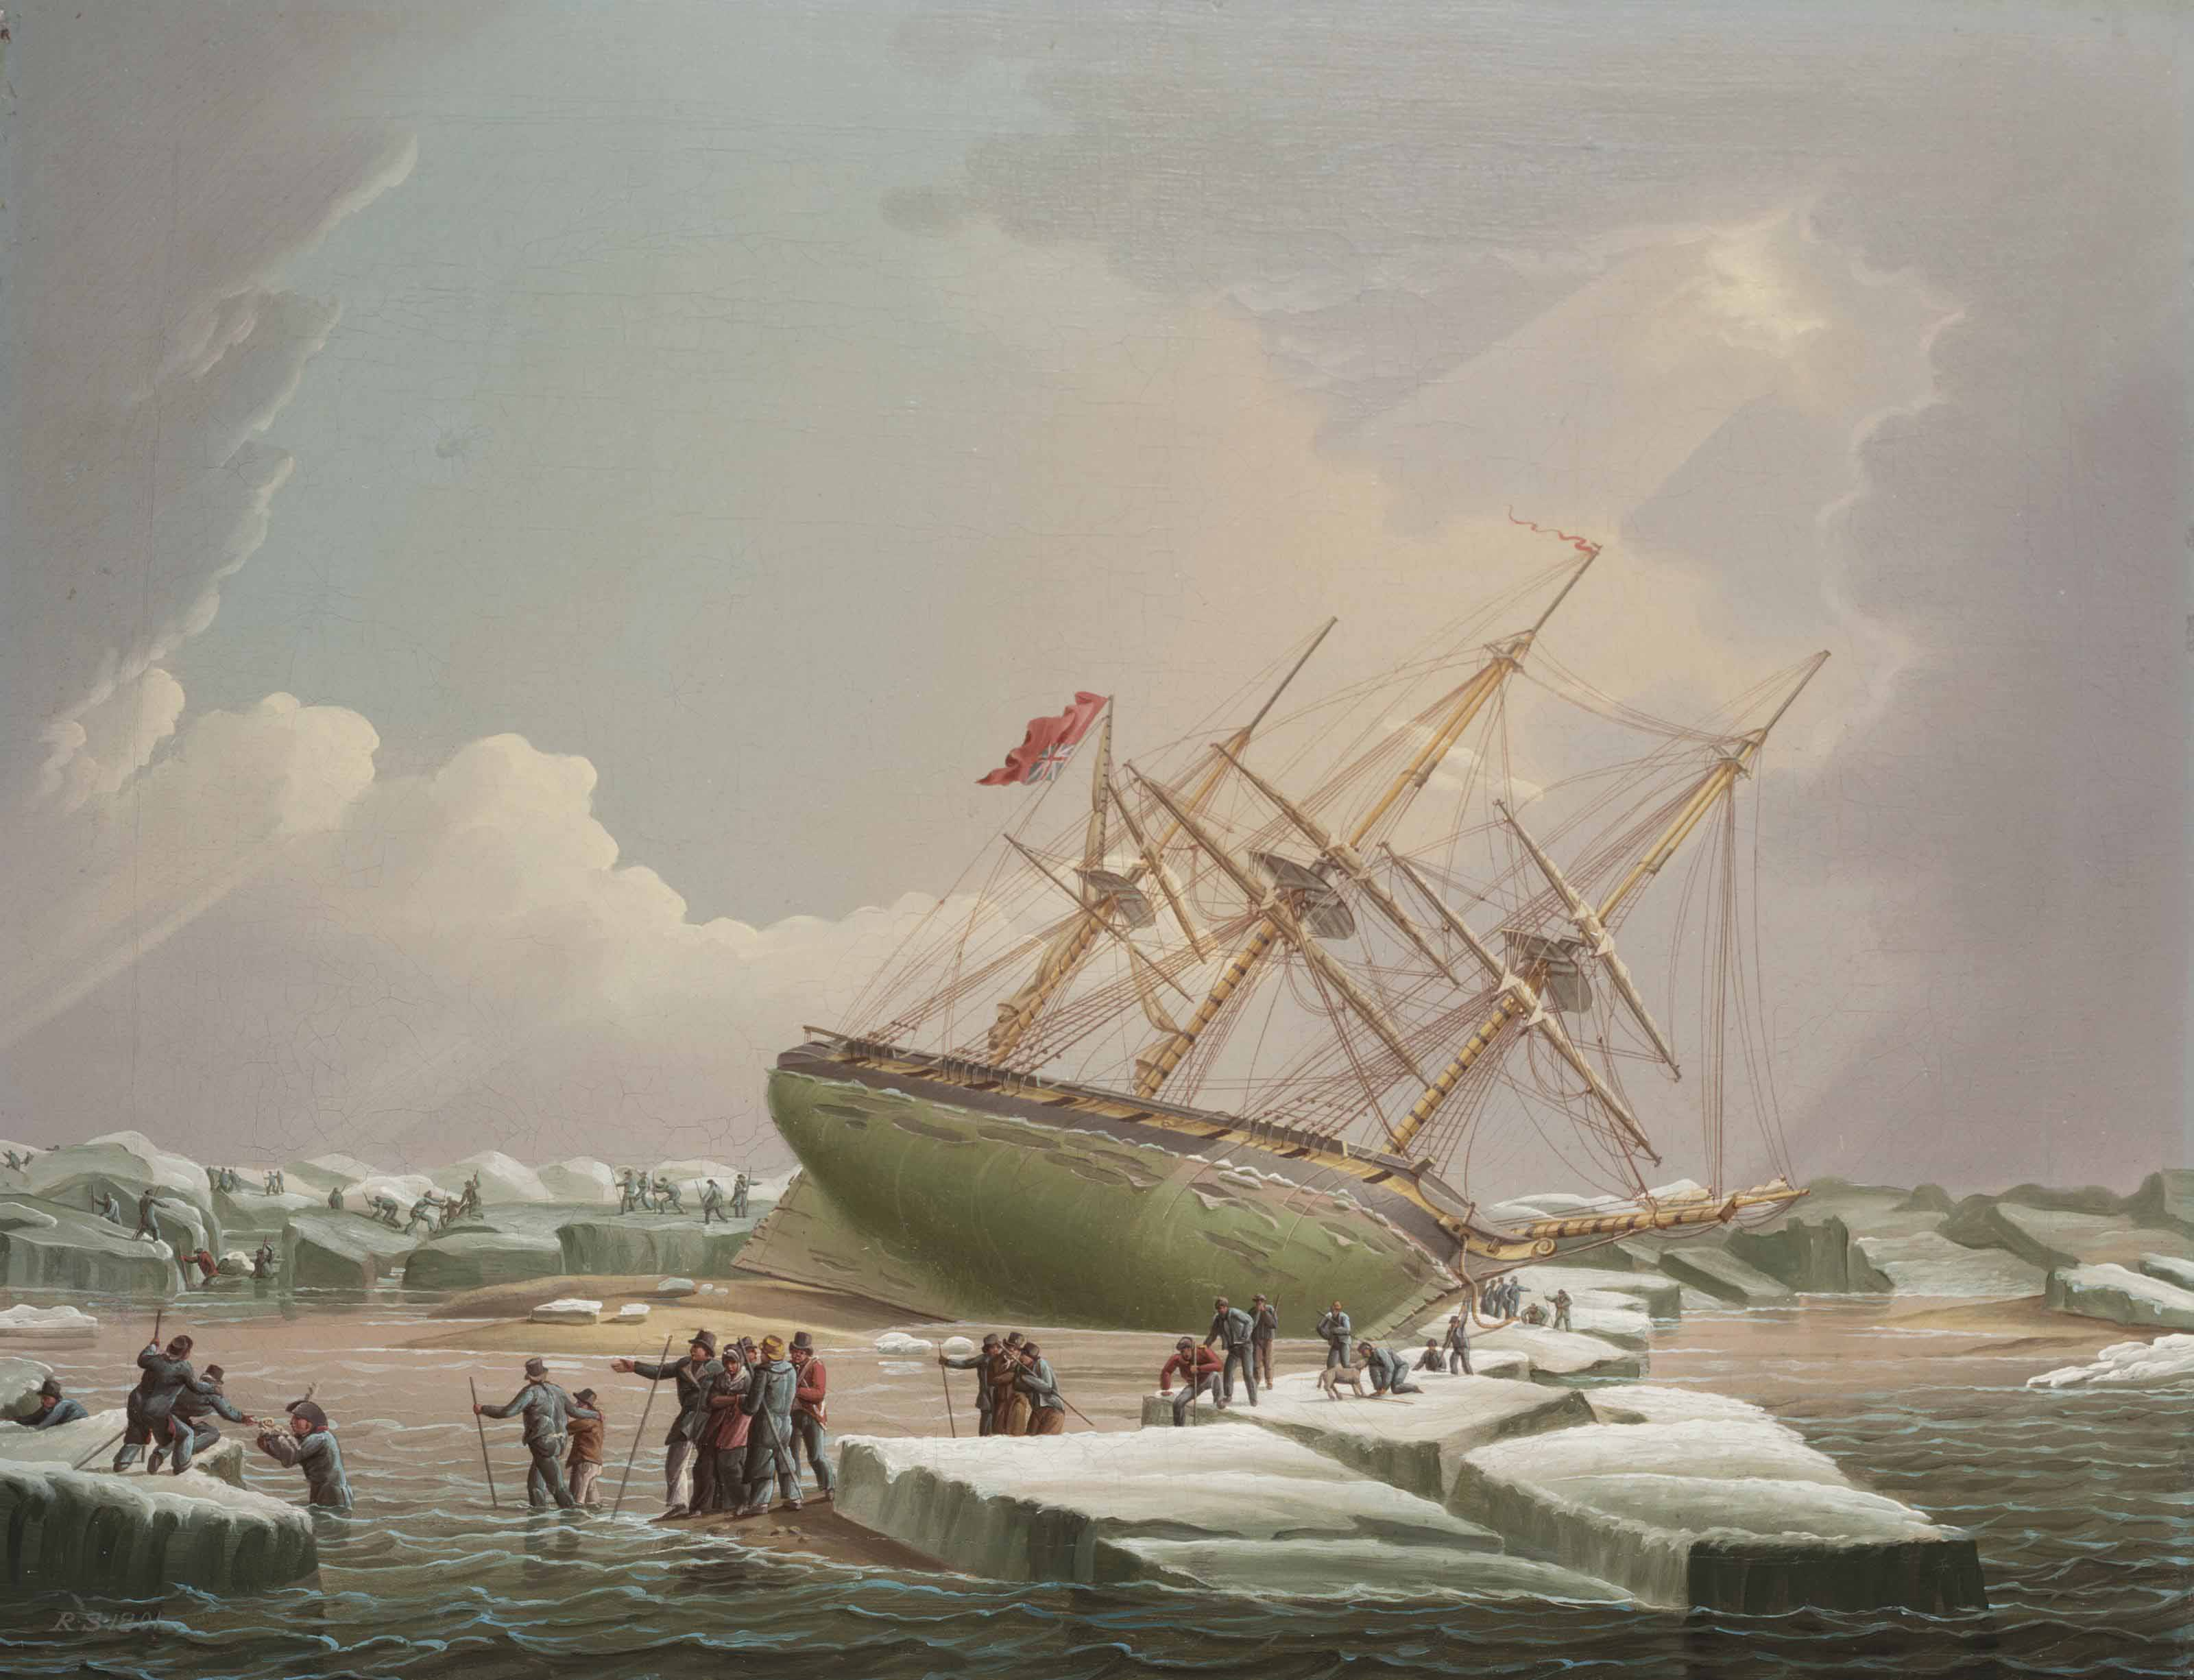 Shipwreck on Ice